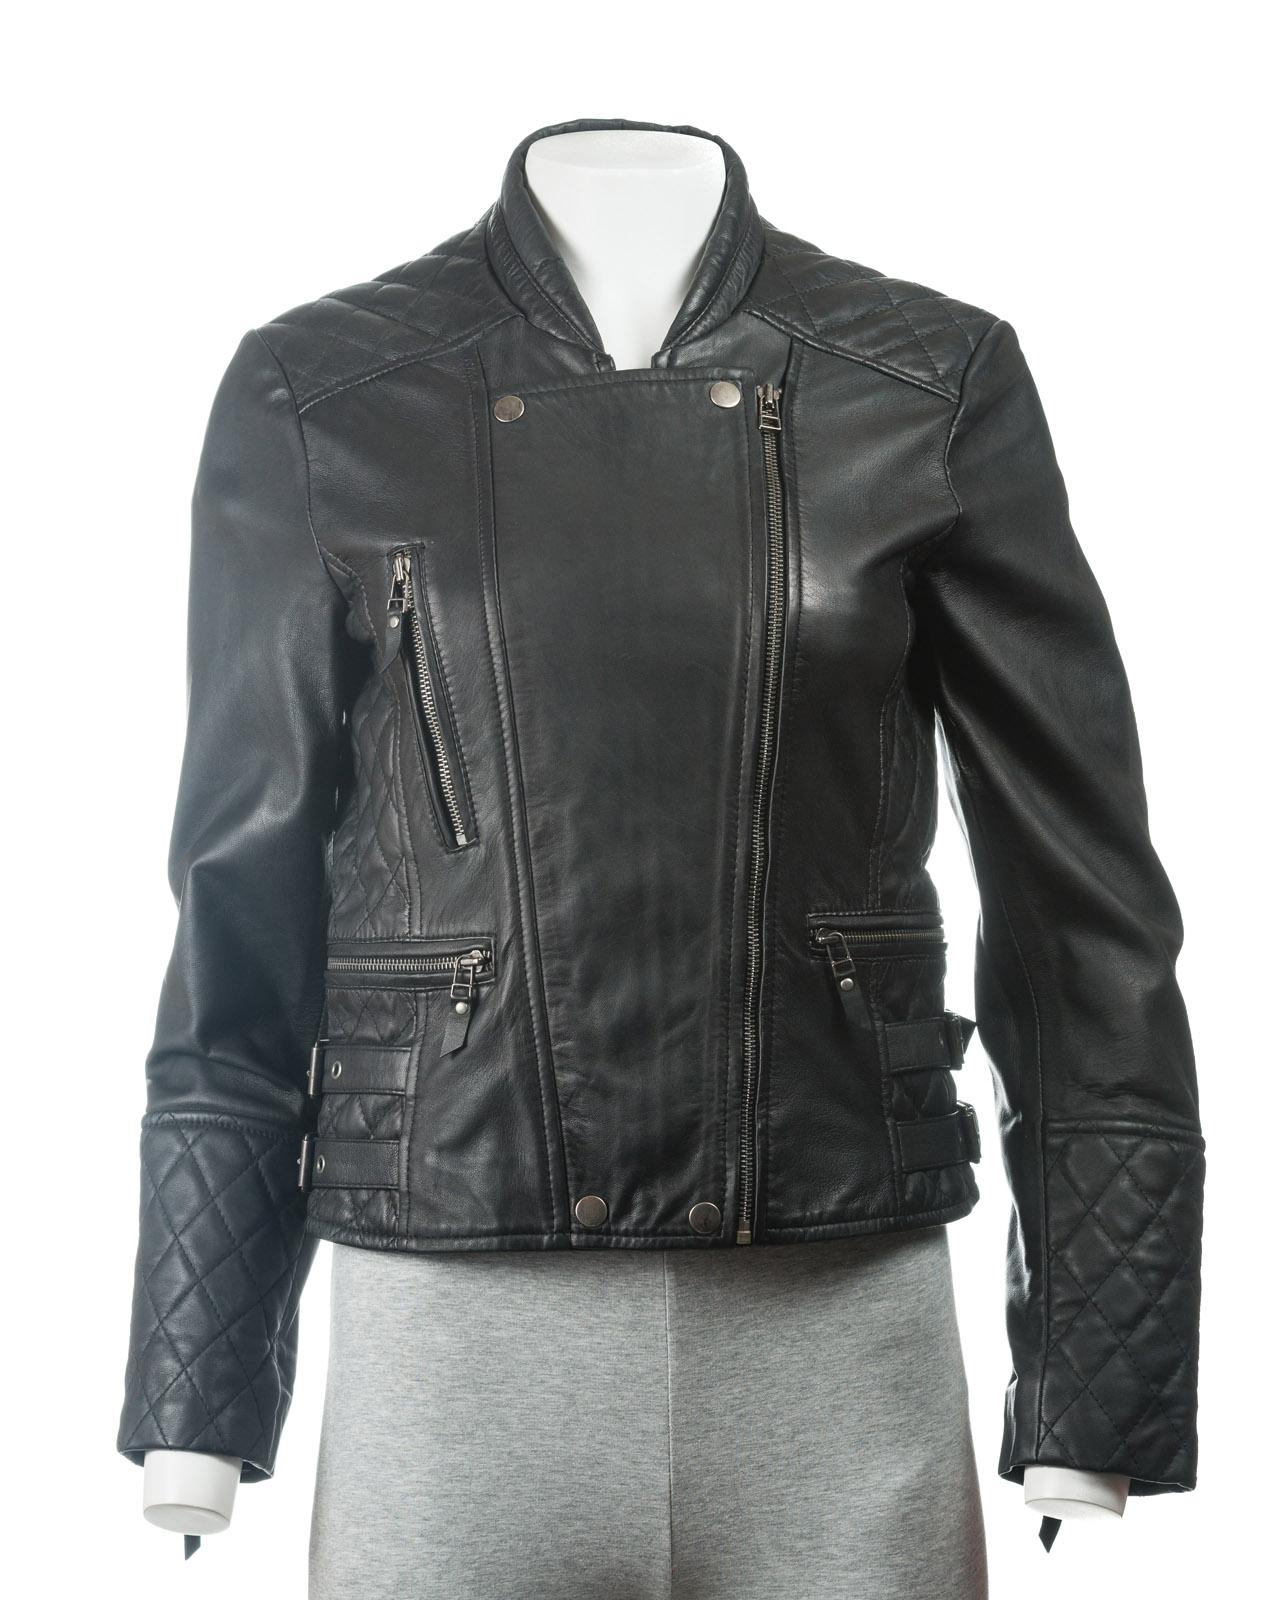 Ladies Black Slim Fit Leather Biker Jacket With Stand Up